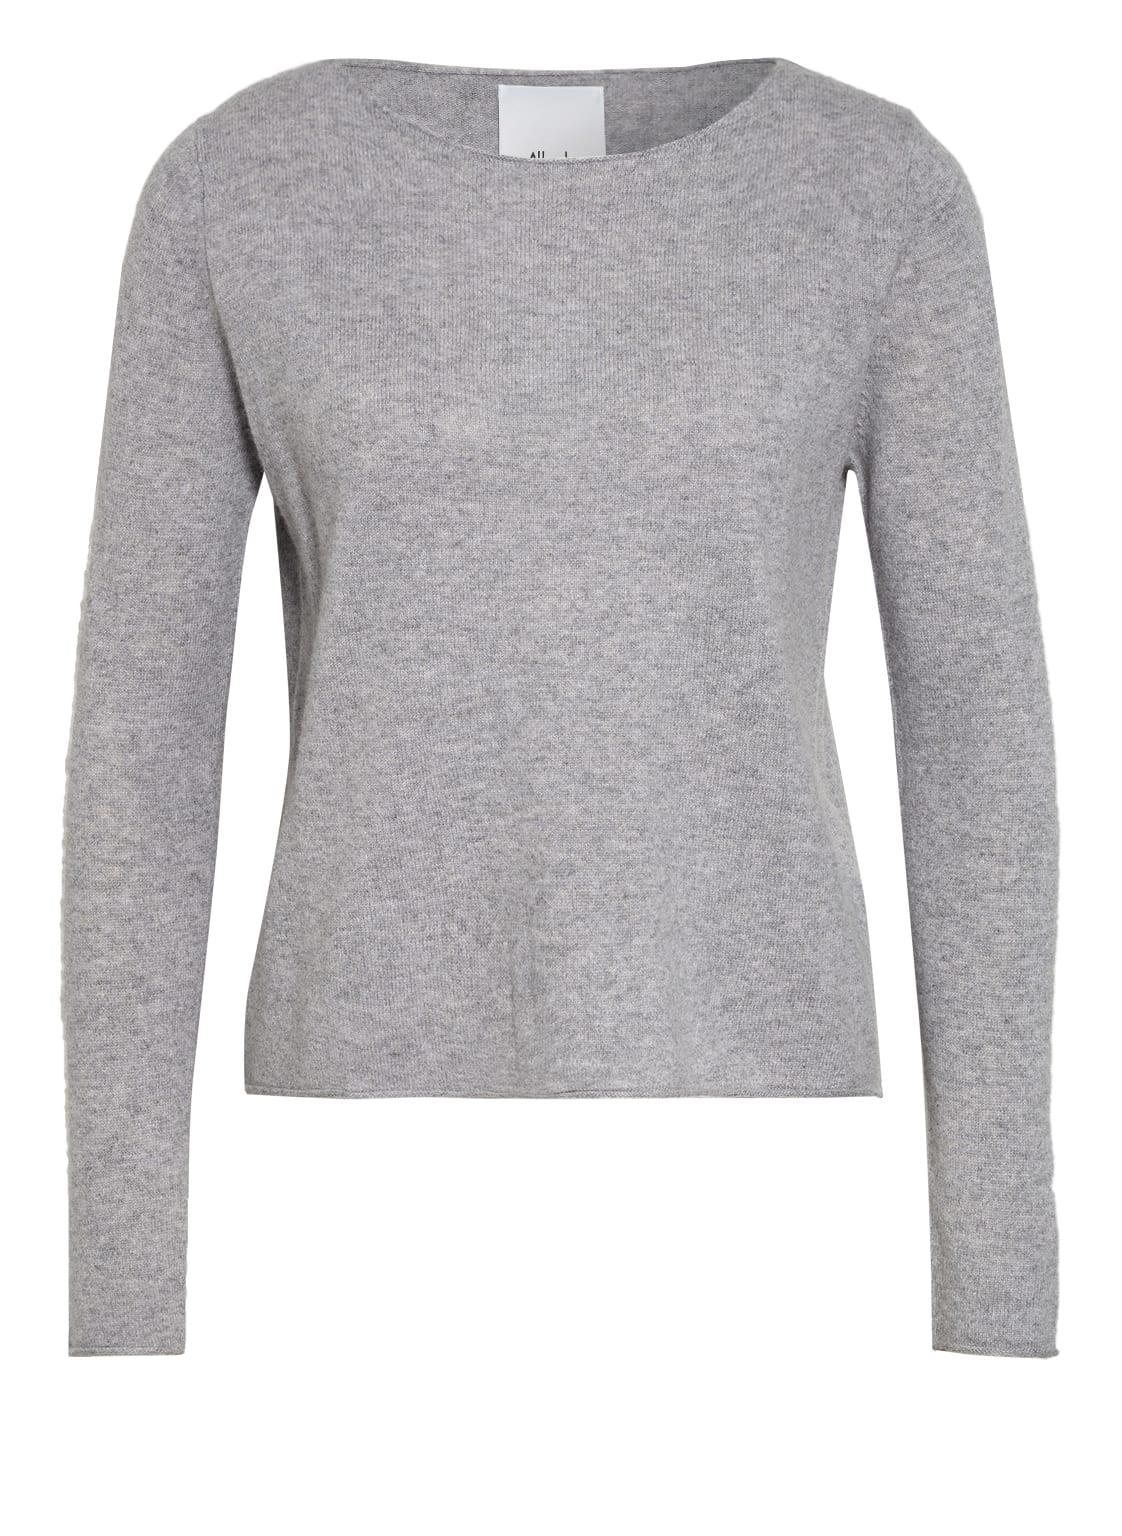 Image of Allude Cashmere-Pullover grau